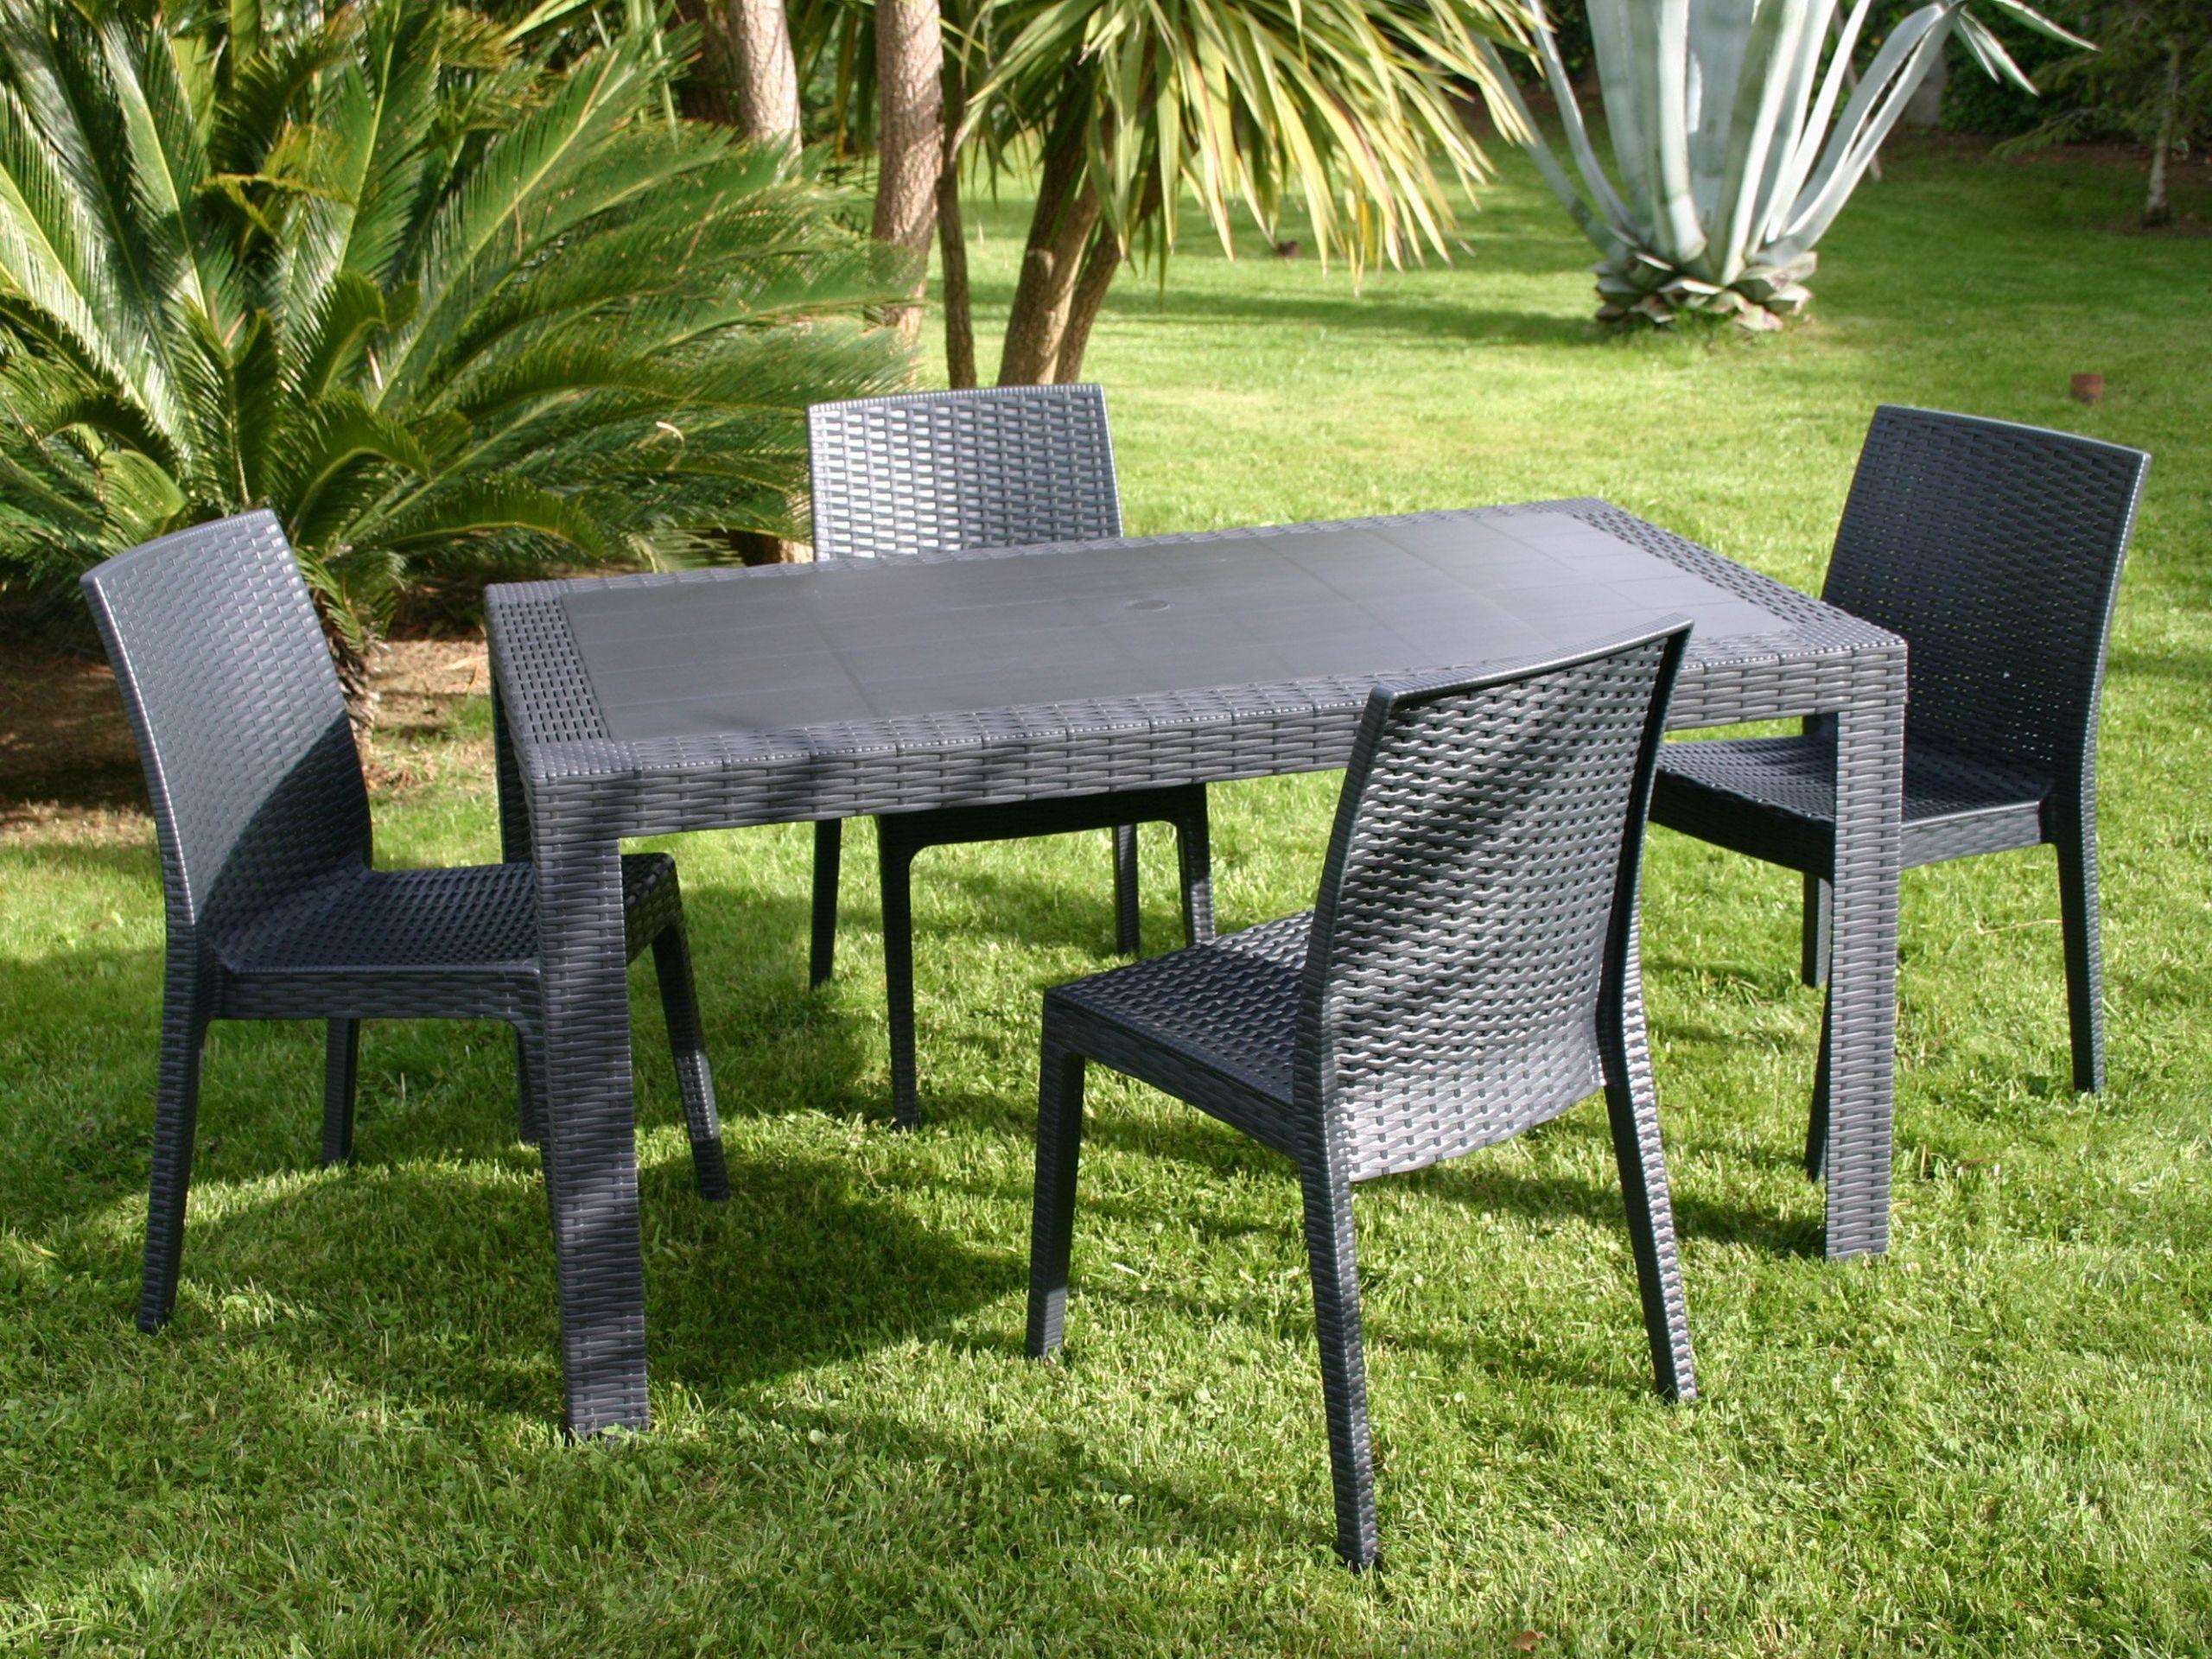 Cora Salon De Jardin - Canalcncarauca concernant Table De Jardin Cora